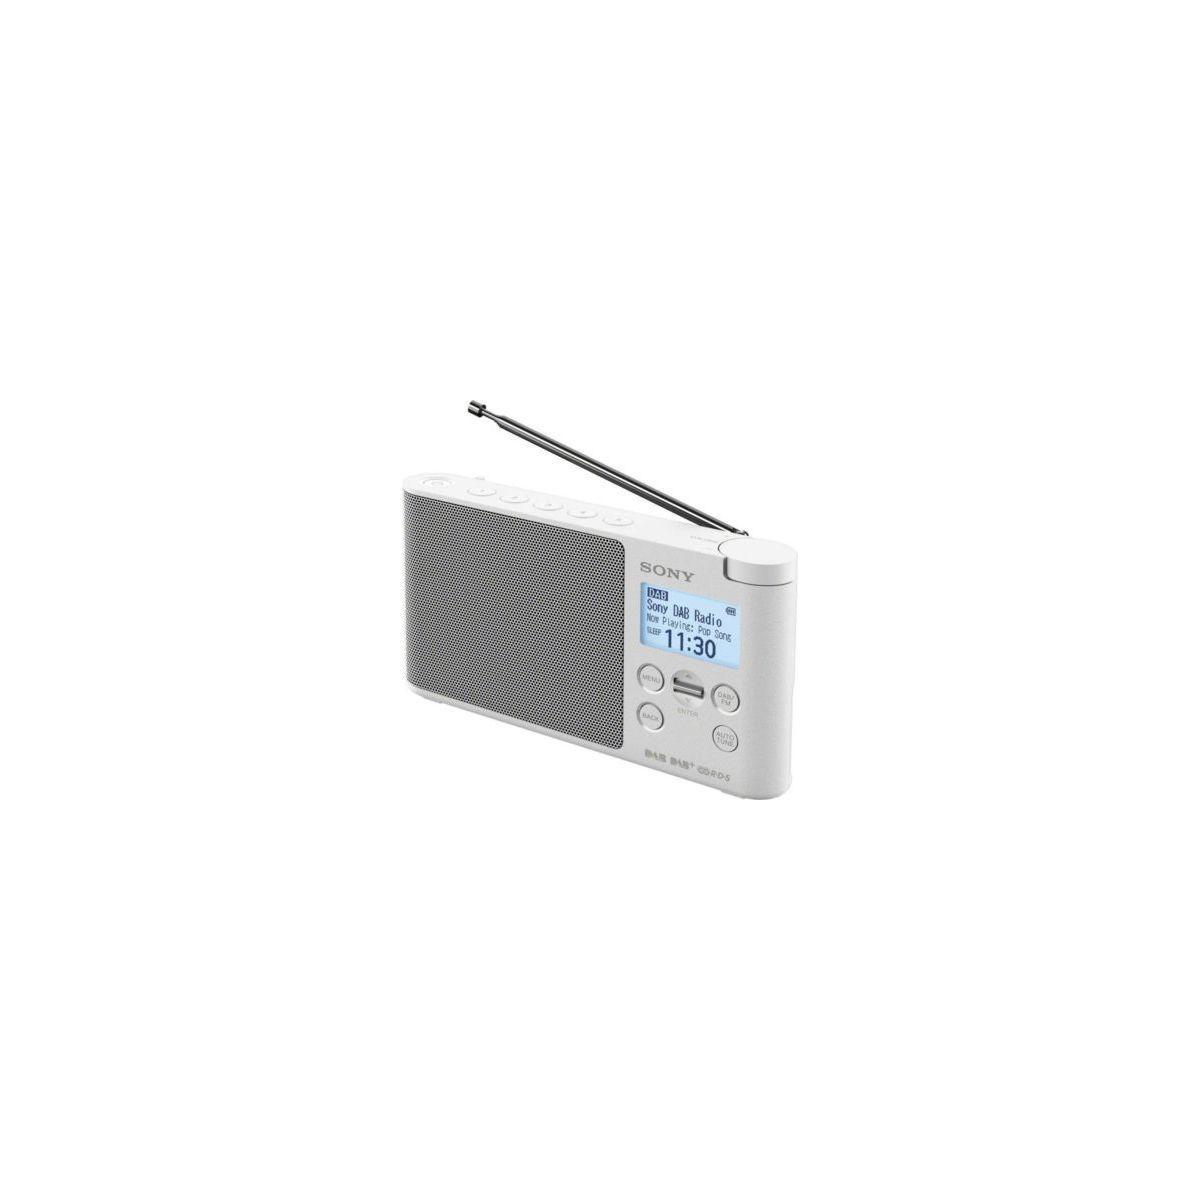 Radio num�rique sony xdrs41dbw.eu8 blanc - livraison offerte : code premium